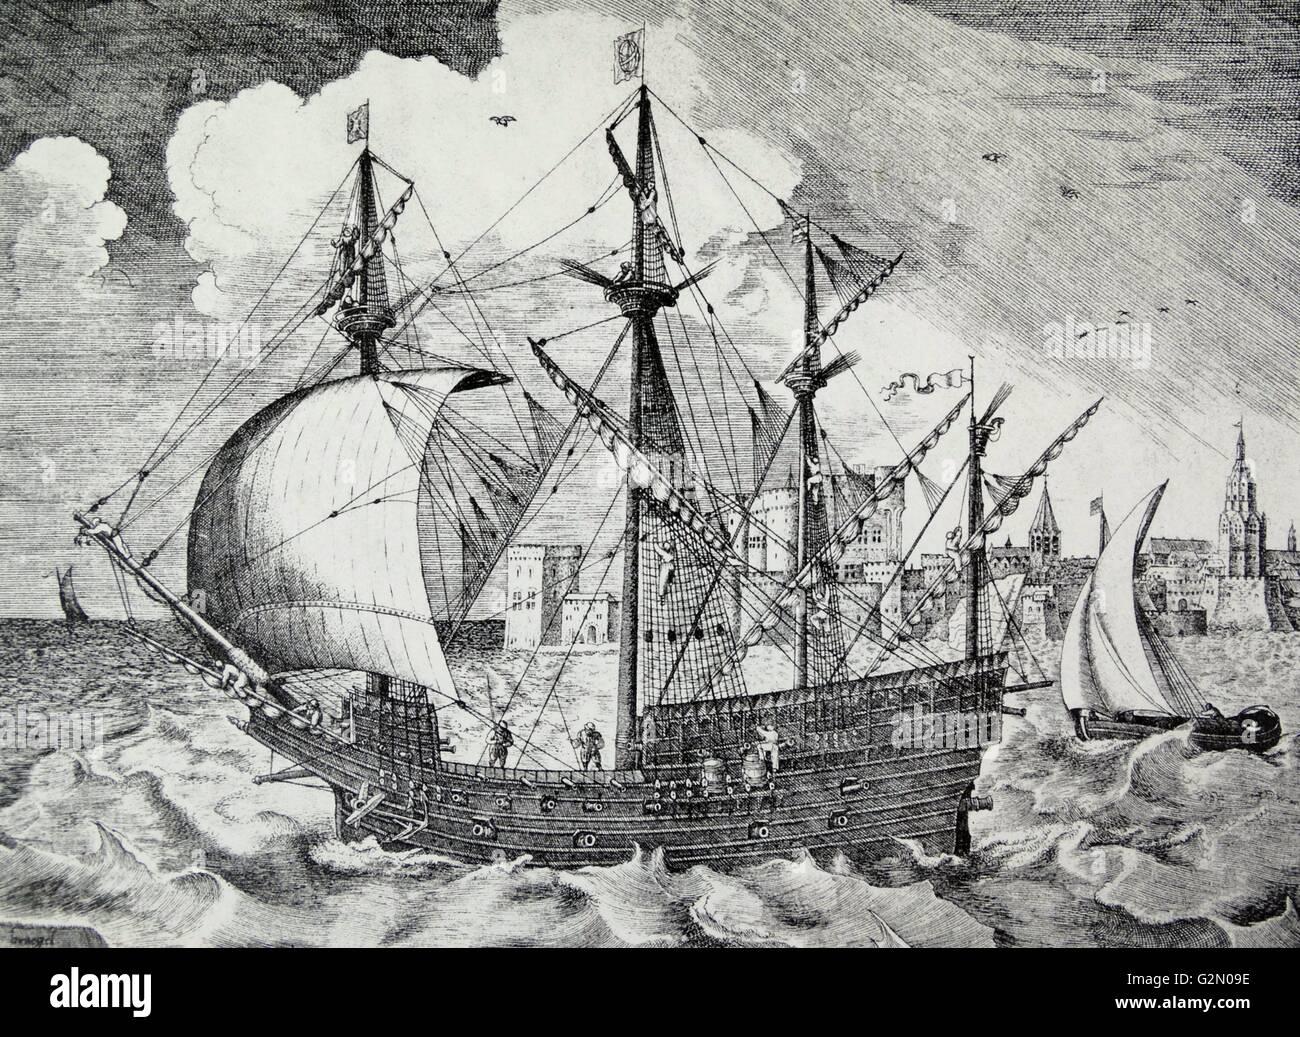 sixteenth century Portuguese or Spanish ship by Pieter Brueghel - Stock Image